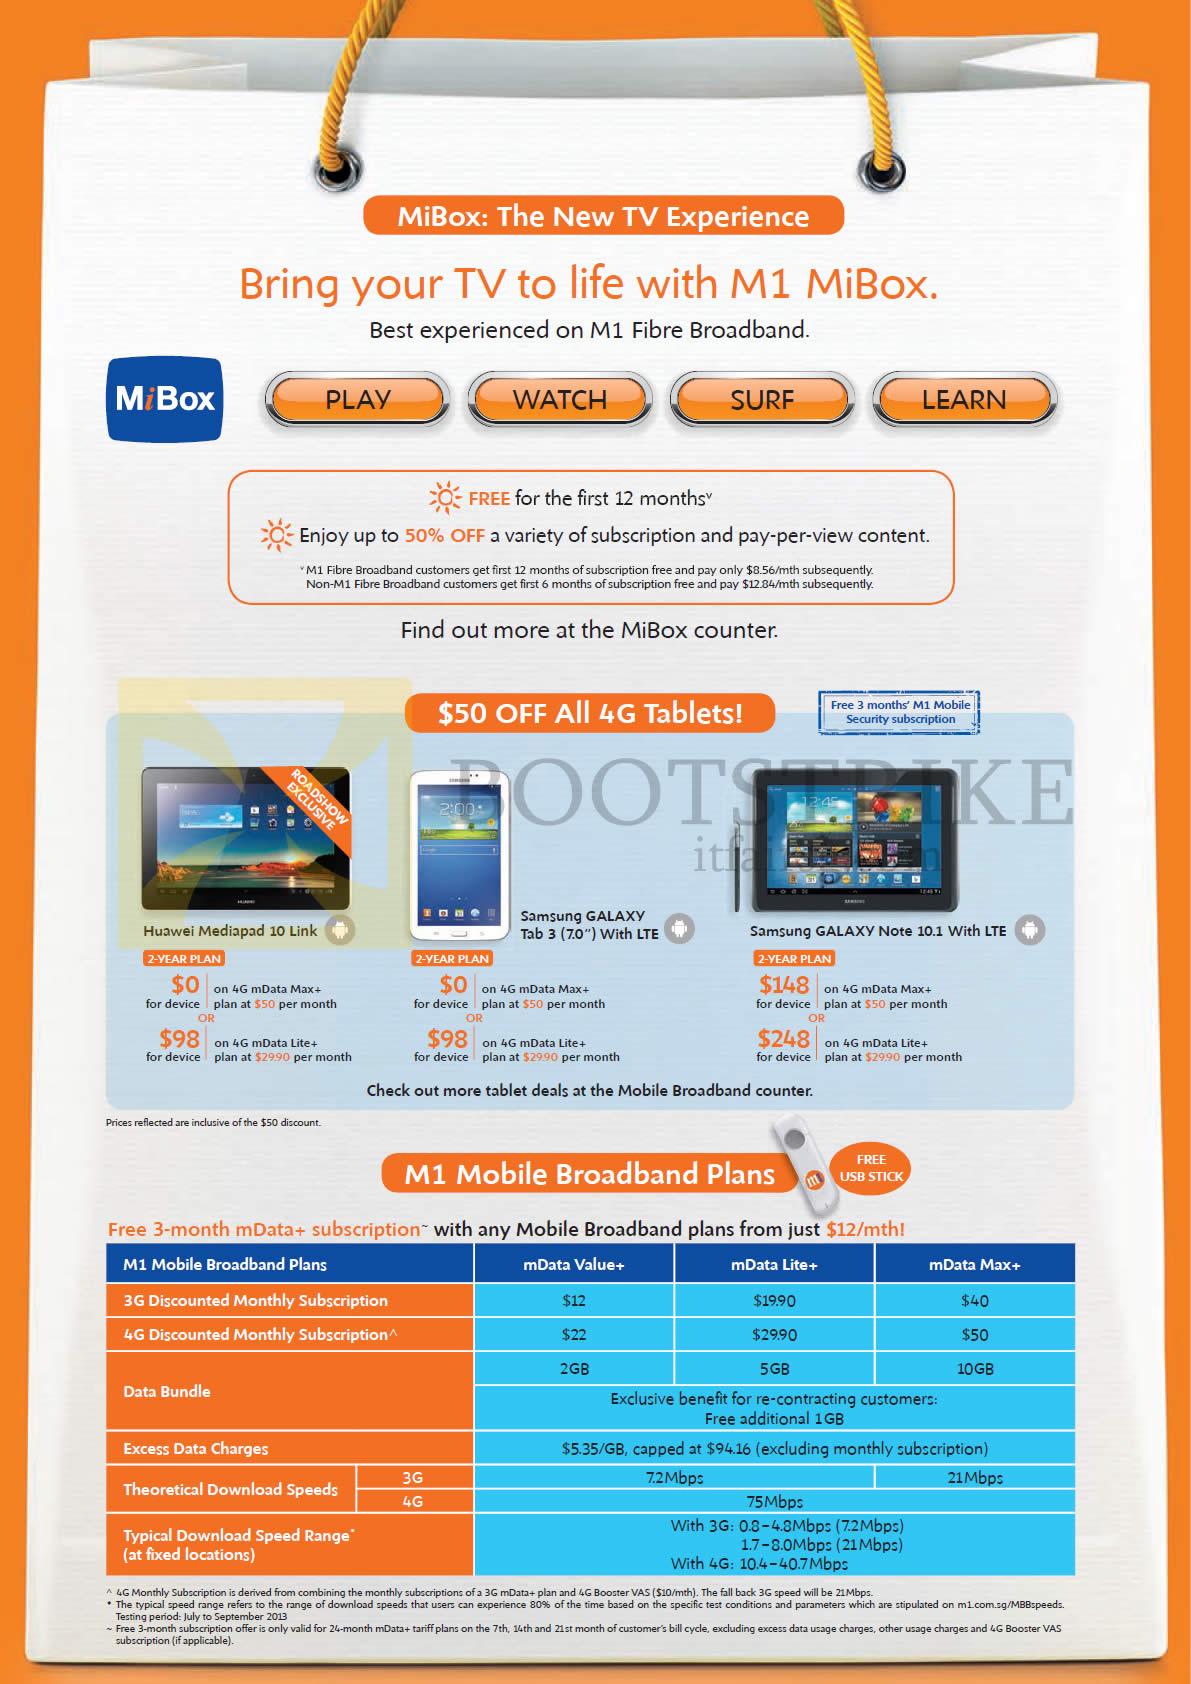 SITEX 2013 price list image brochure of M1 Mobile Broadband Tablets Huawei Mediapad 10 Link, Samsung Galaxy Tab 3 7.0, Note 10.1, Mobile Broadband Plans MData Value Lite Max, MiBox